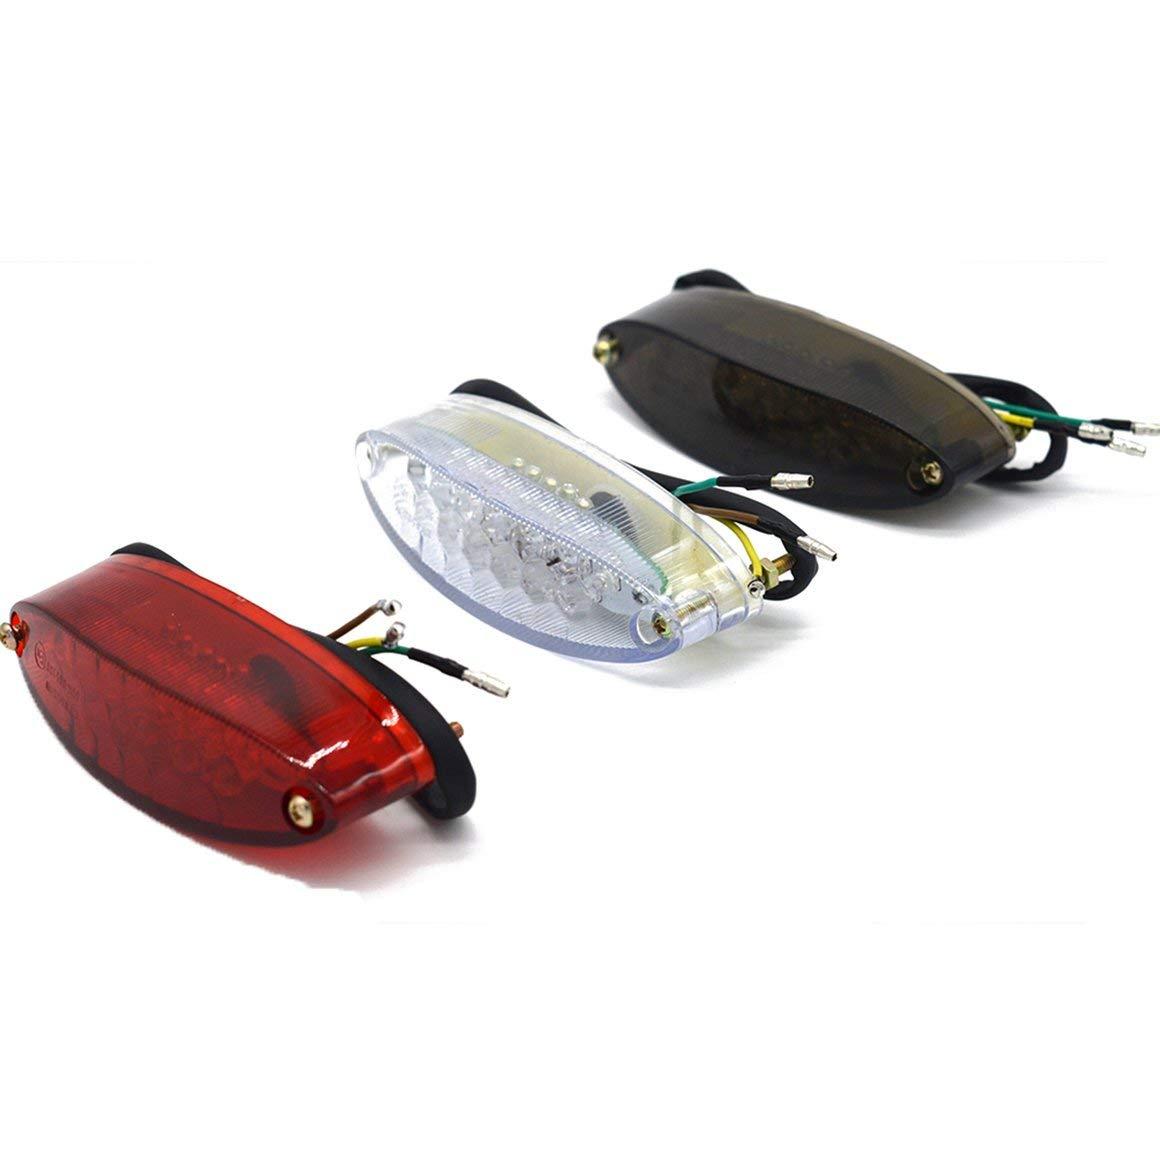 Funnyrunstore Universal Motorcycle LED Tail Light Indicador de Freno L/ámpara Moto trasera Accesorios Modificados Luz Decorativa rojo